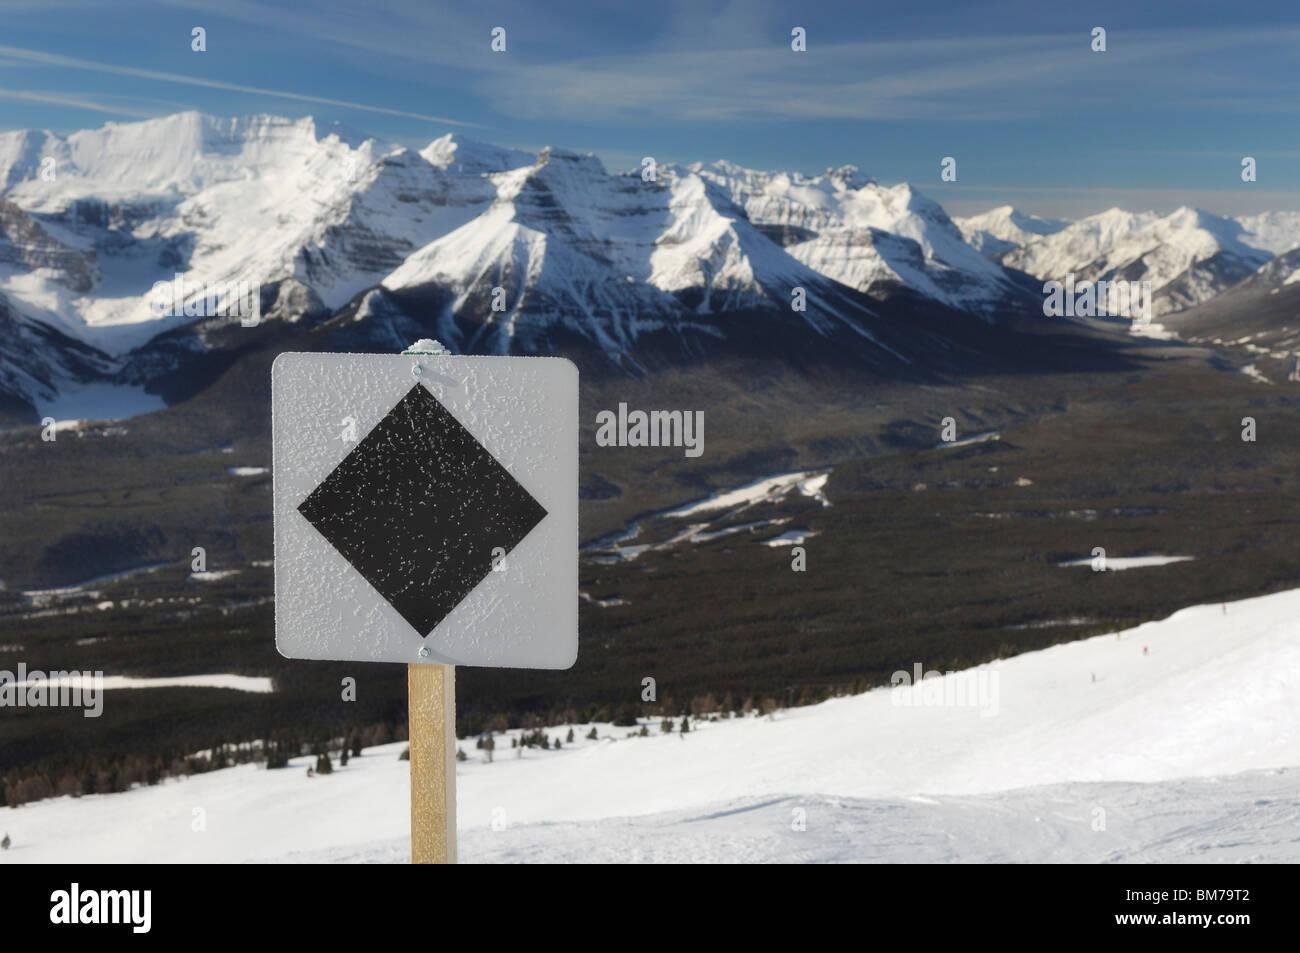 black diamond run at lake louise ski resort - banff national park